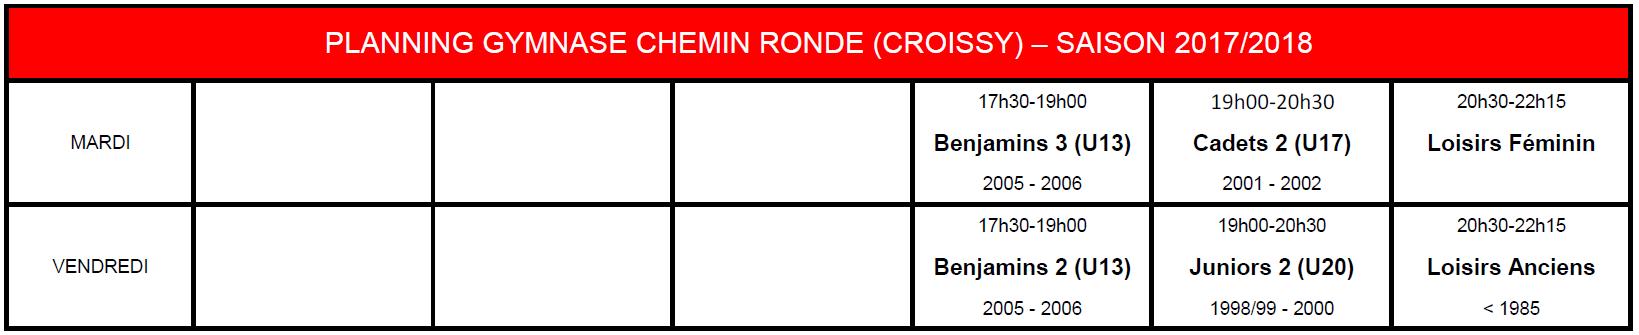 calendrier scolaire 1998-99